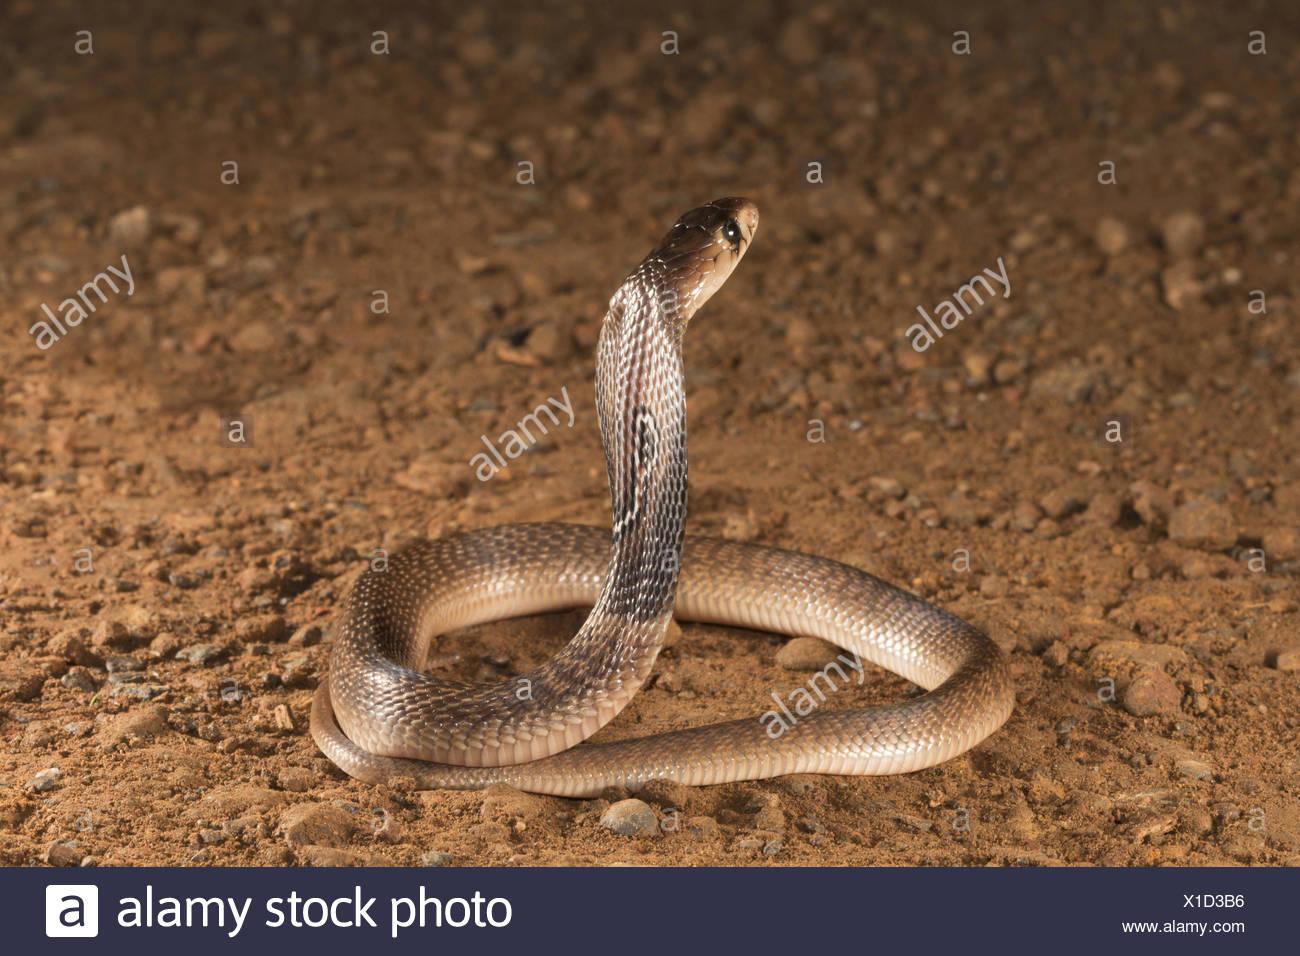 Oso cobra Naja naja Familia: Elaphidae, Aarey Milk Colony, Mumbai, India Foto de stock